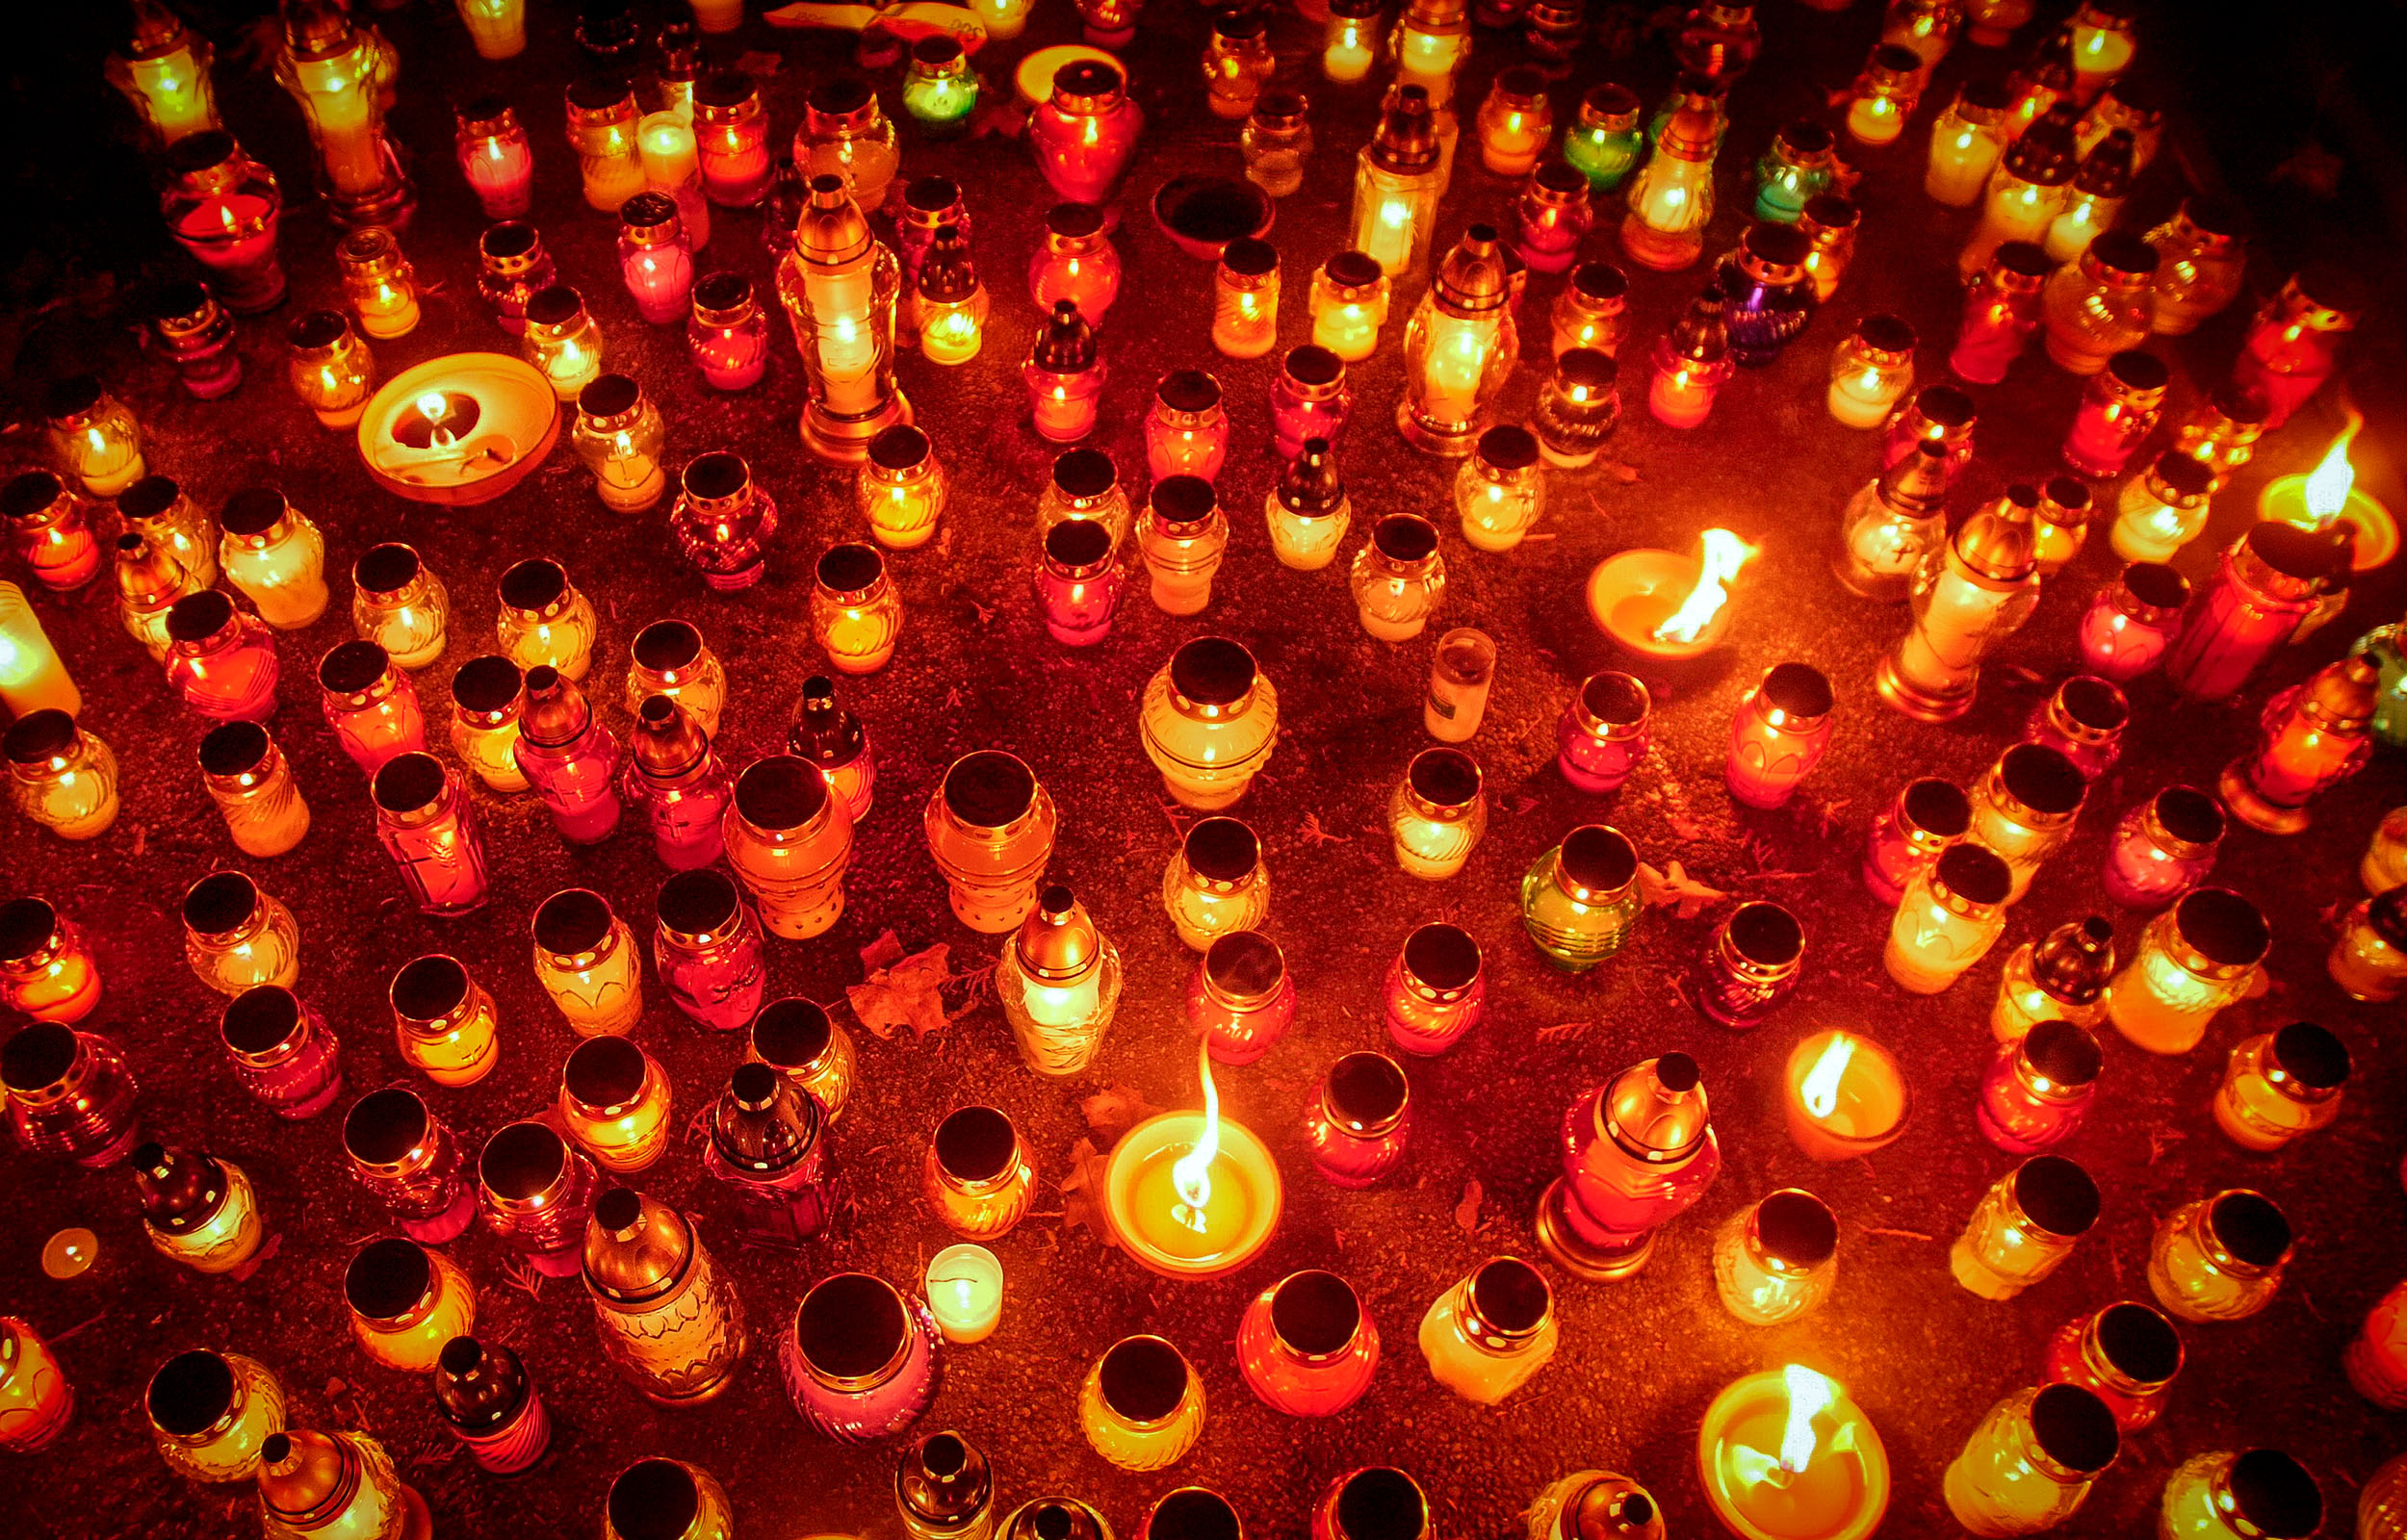 All Saints Day in Poland - Powazki Cemetery